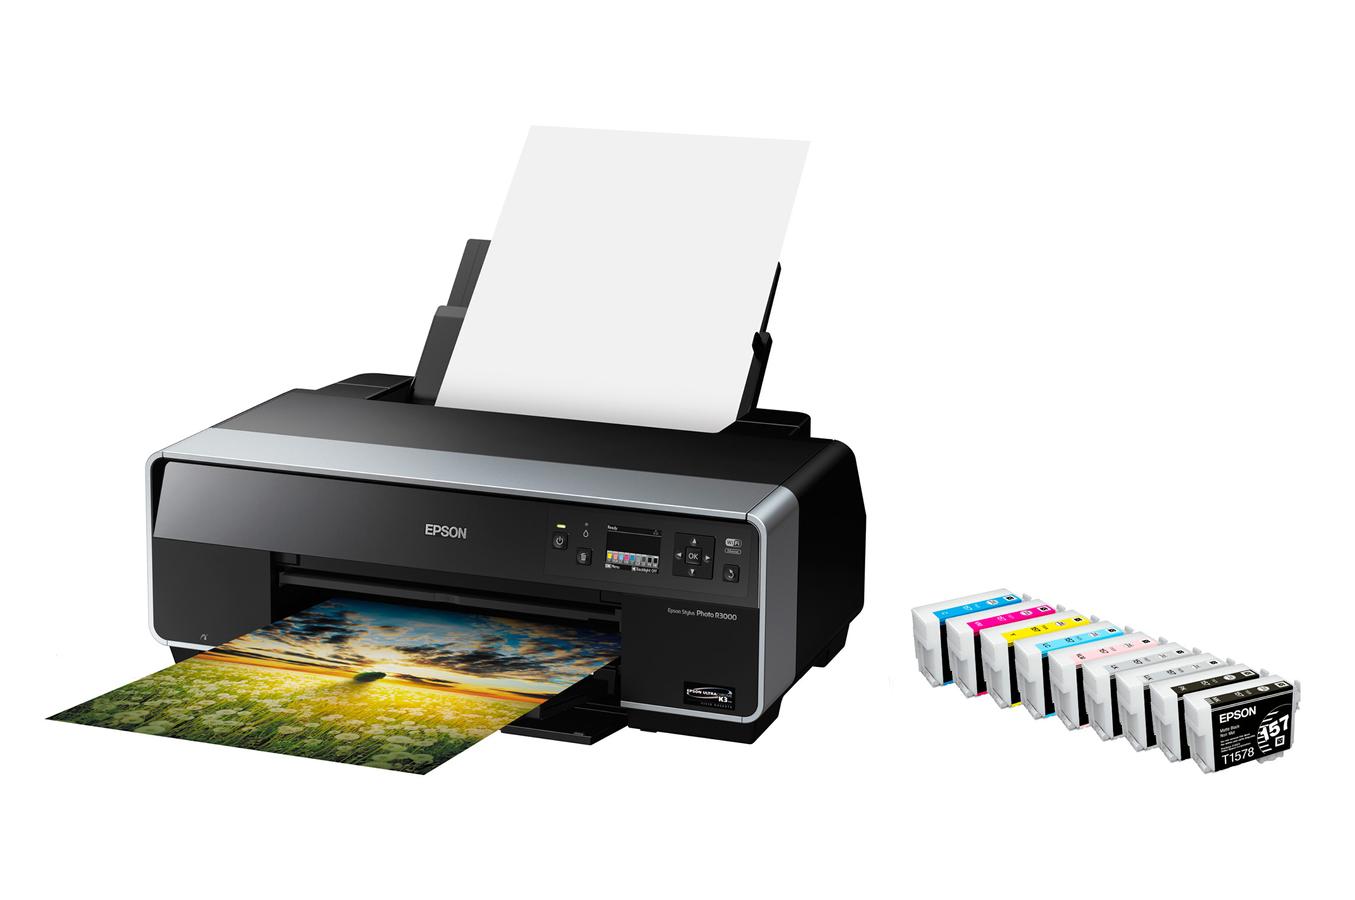 imprimante photo epson stylus photo r3000 r3000 8907765. Black Bedroom Furniture Sets. Home Design Ideas